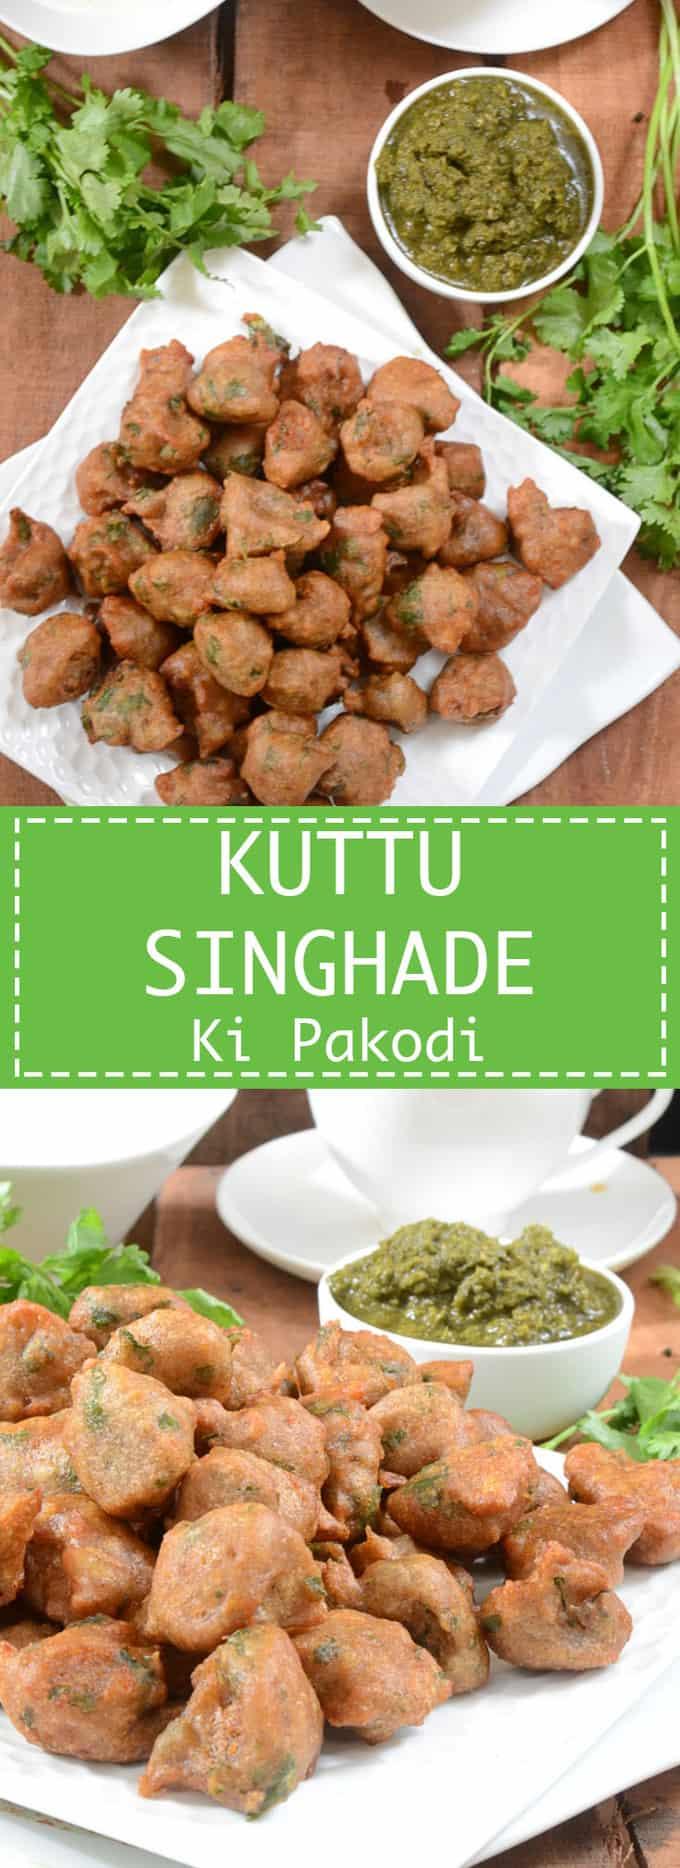 Kuttu Singhade Ki Pakodi